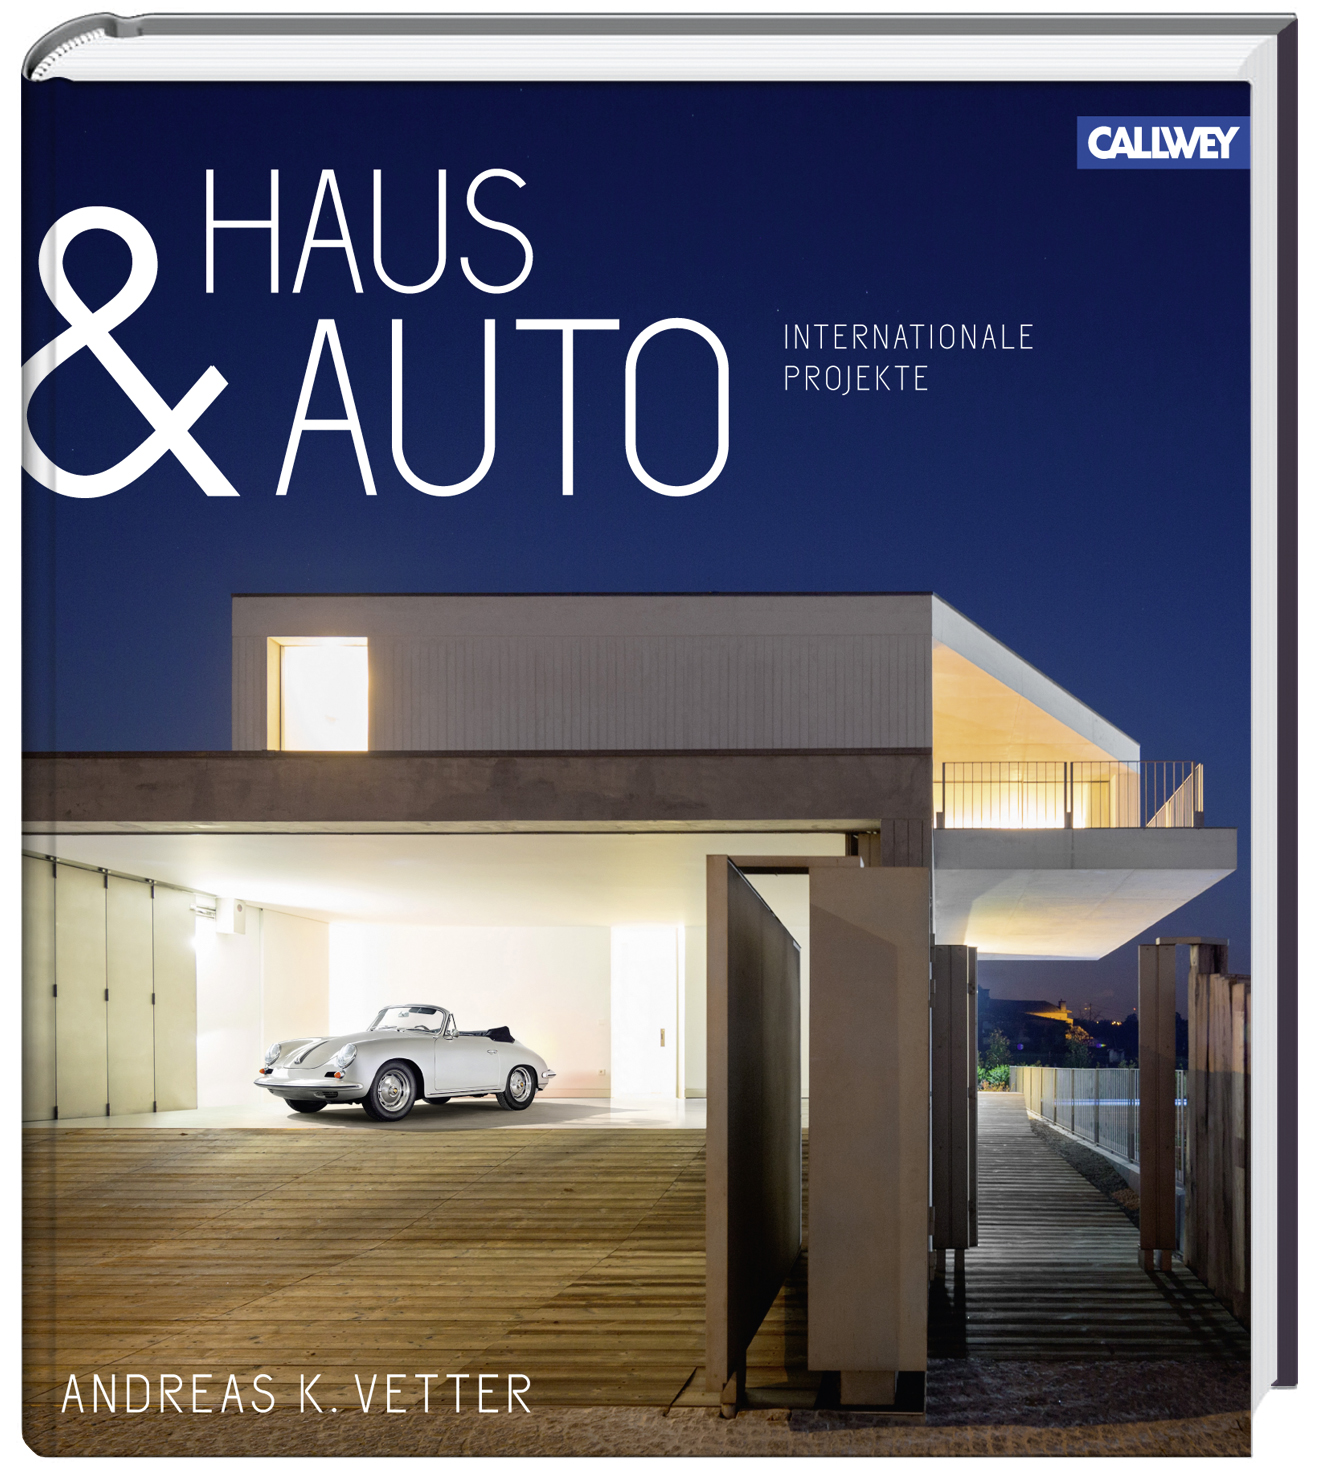 Haus & Auto Andreas K. Vetter